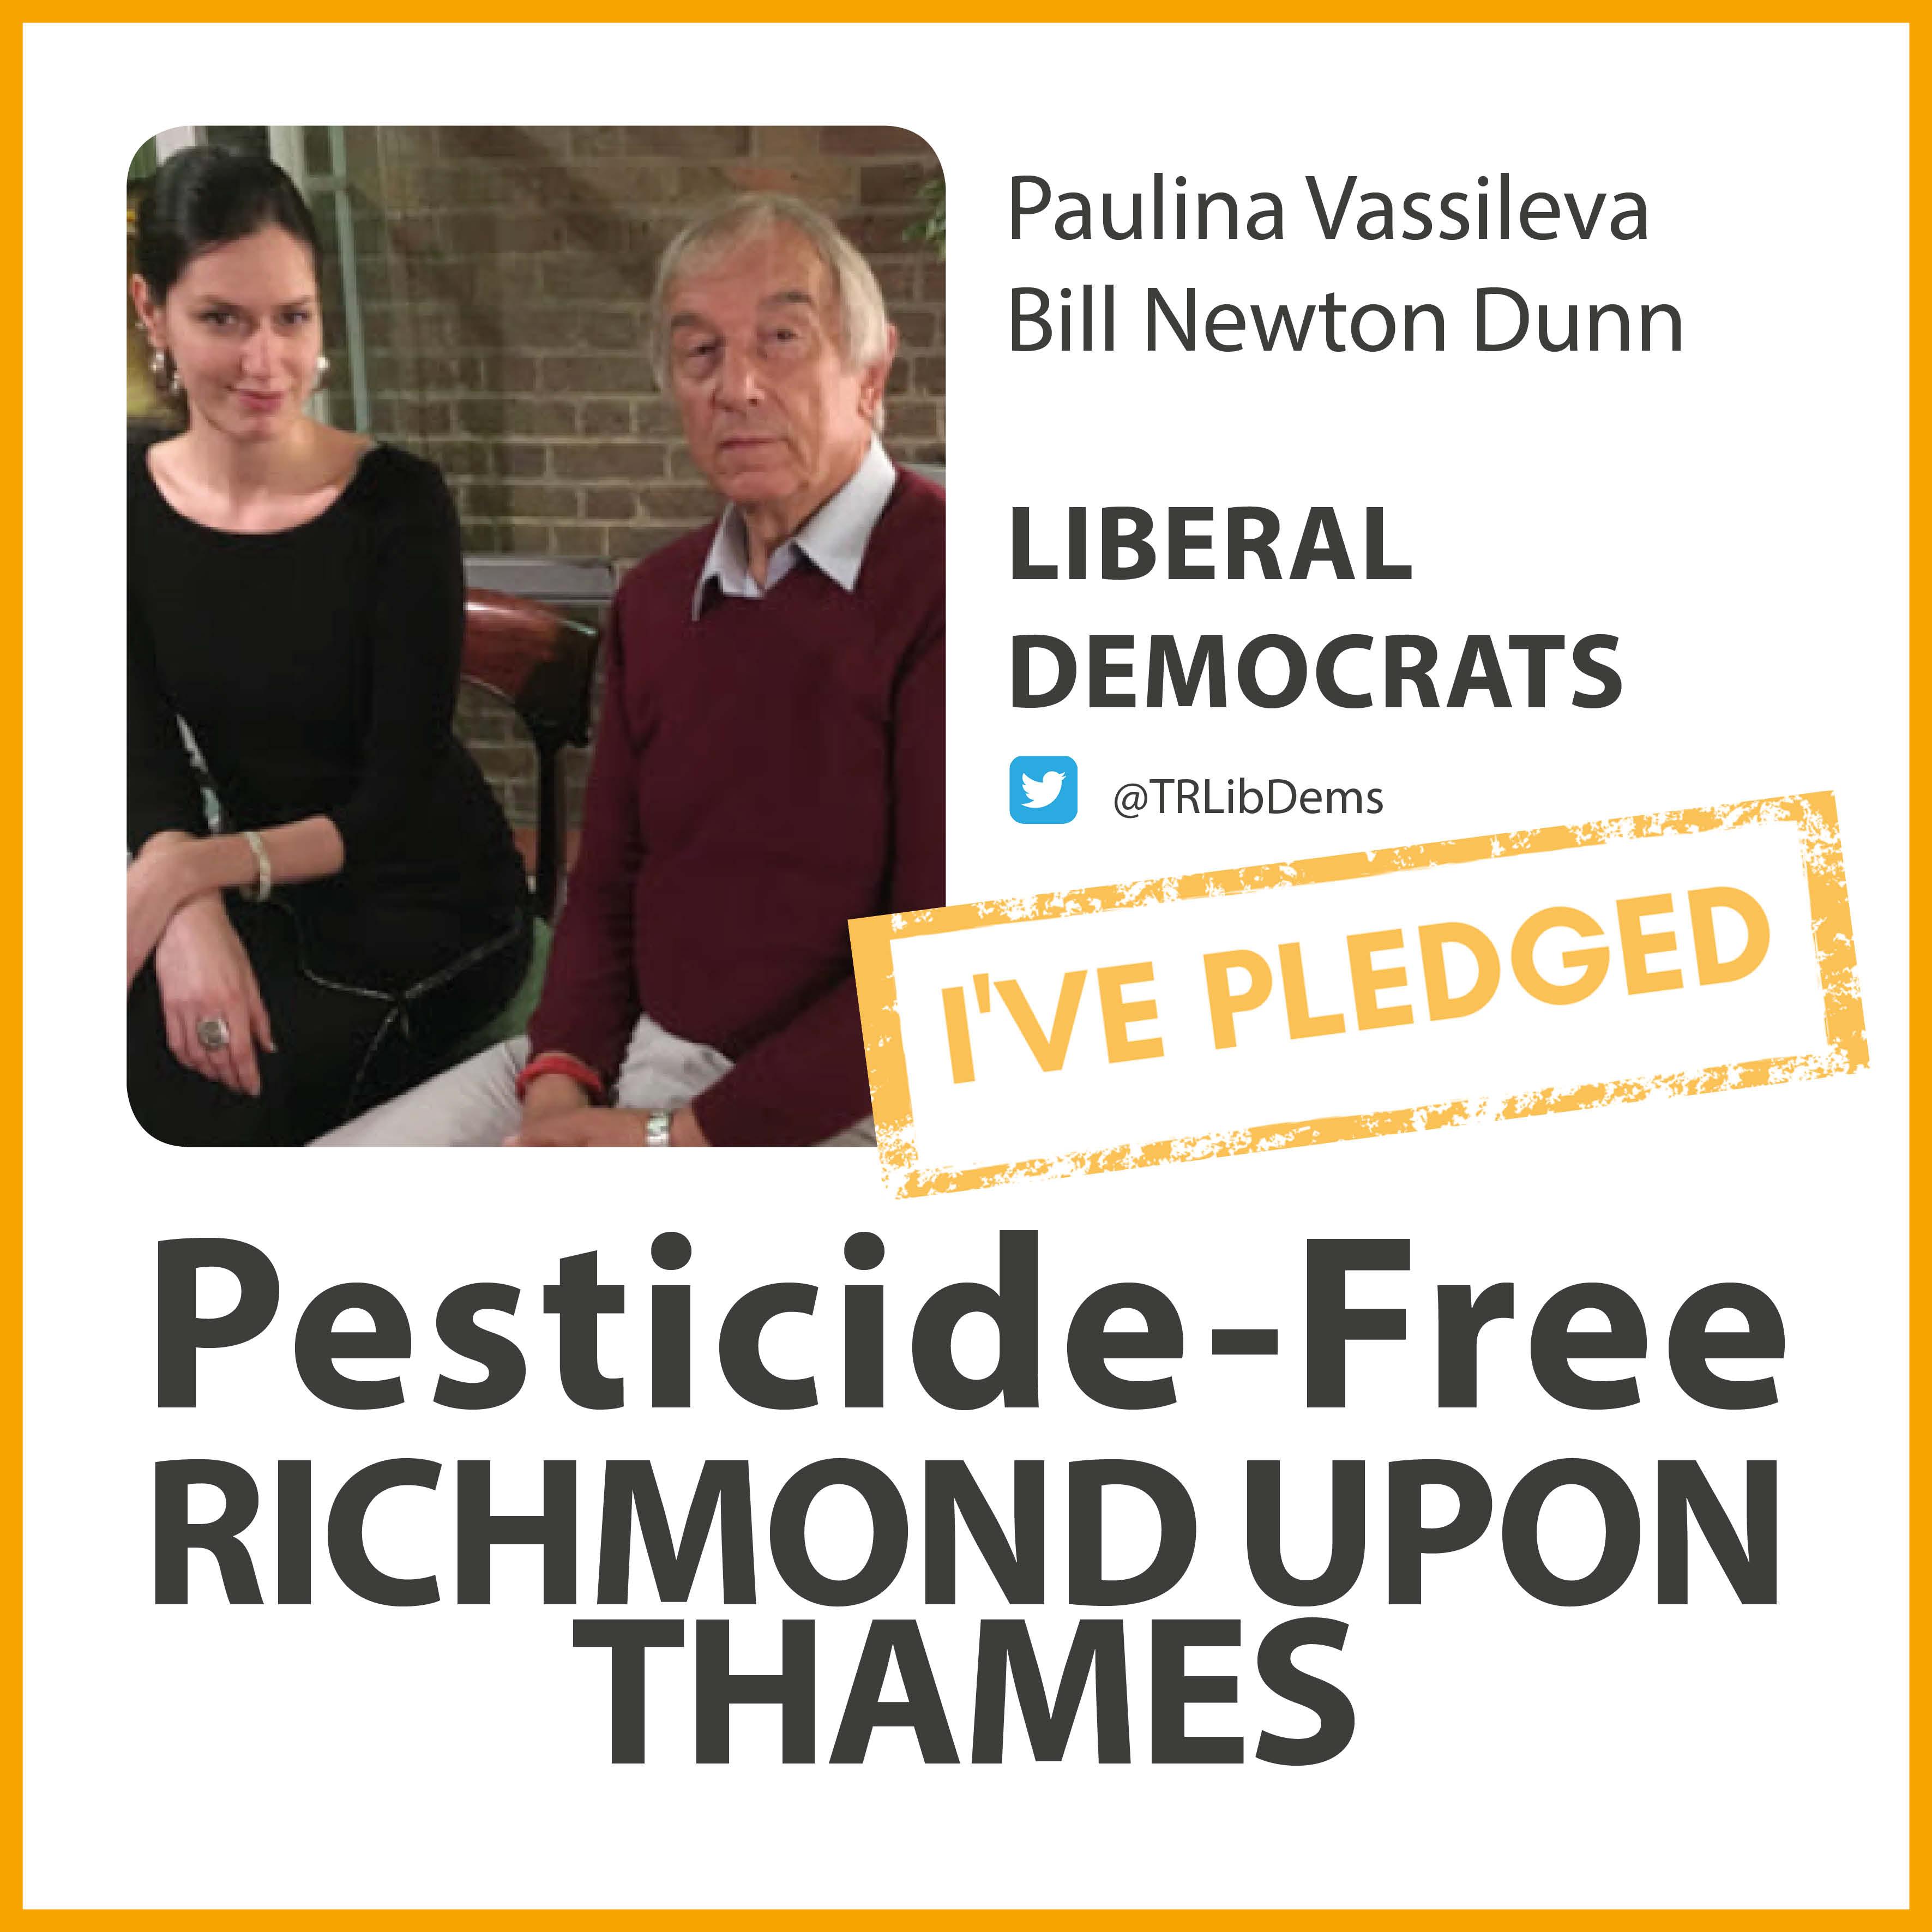 South Richmond Lib Dems have taken the pesticide-free pledge